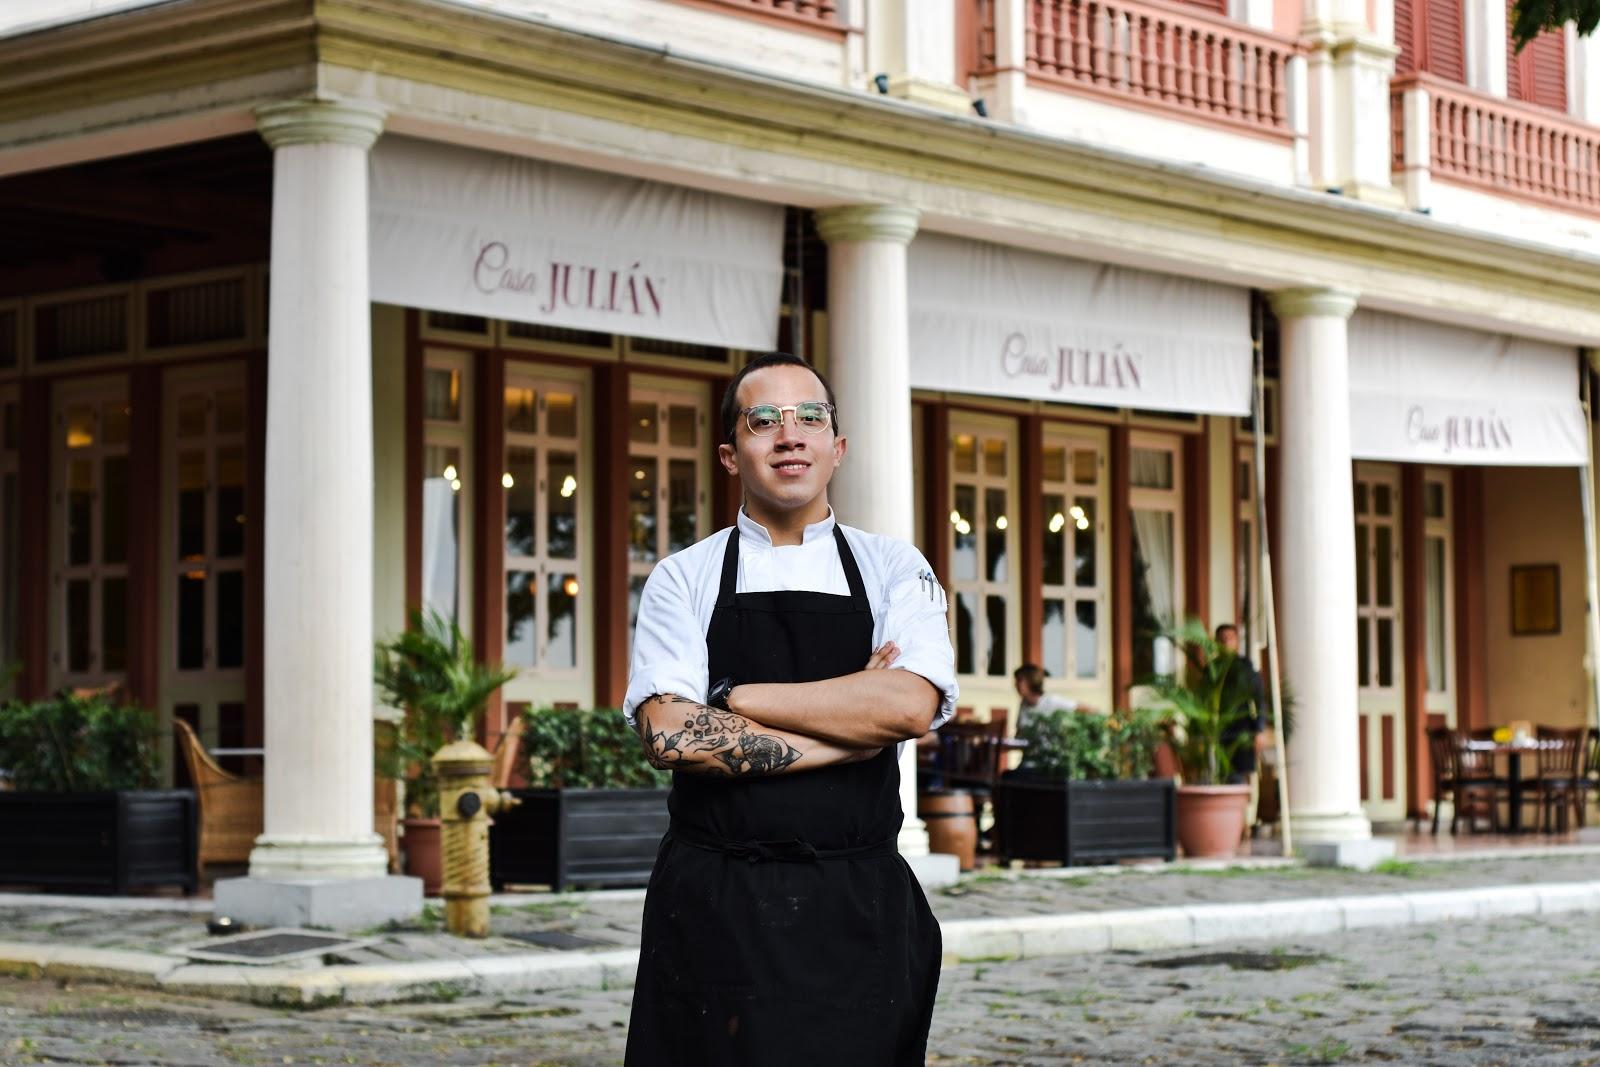 Casa Julian gourmet restaurant's chef Javier